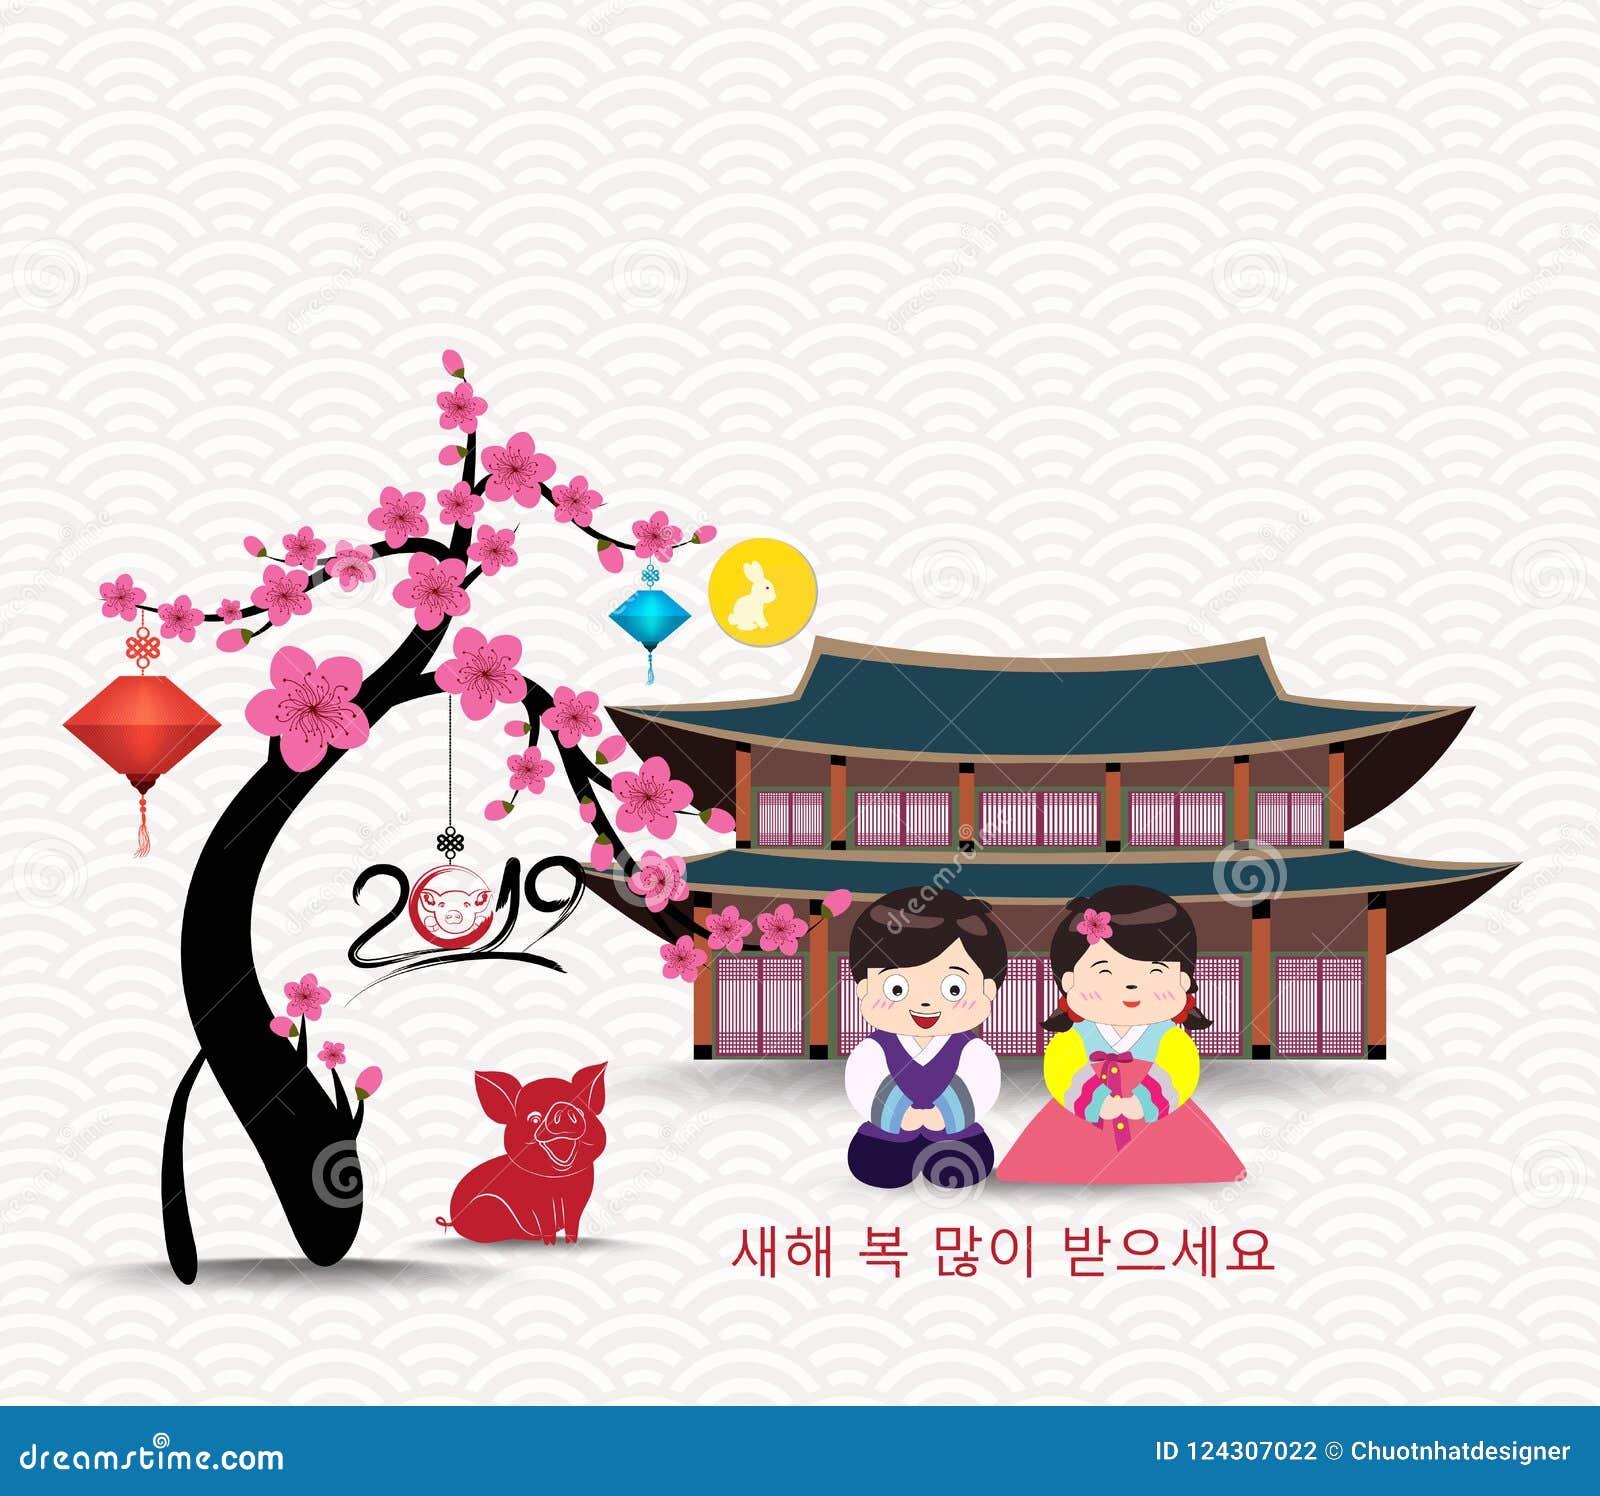 korea new year korean characters mean happy new year children